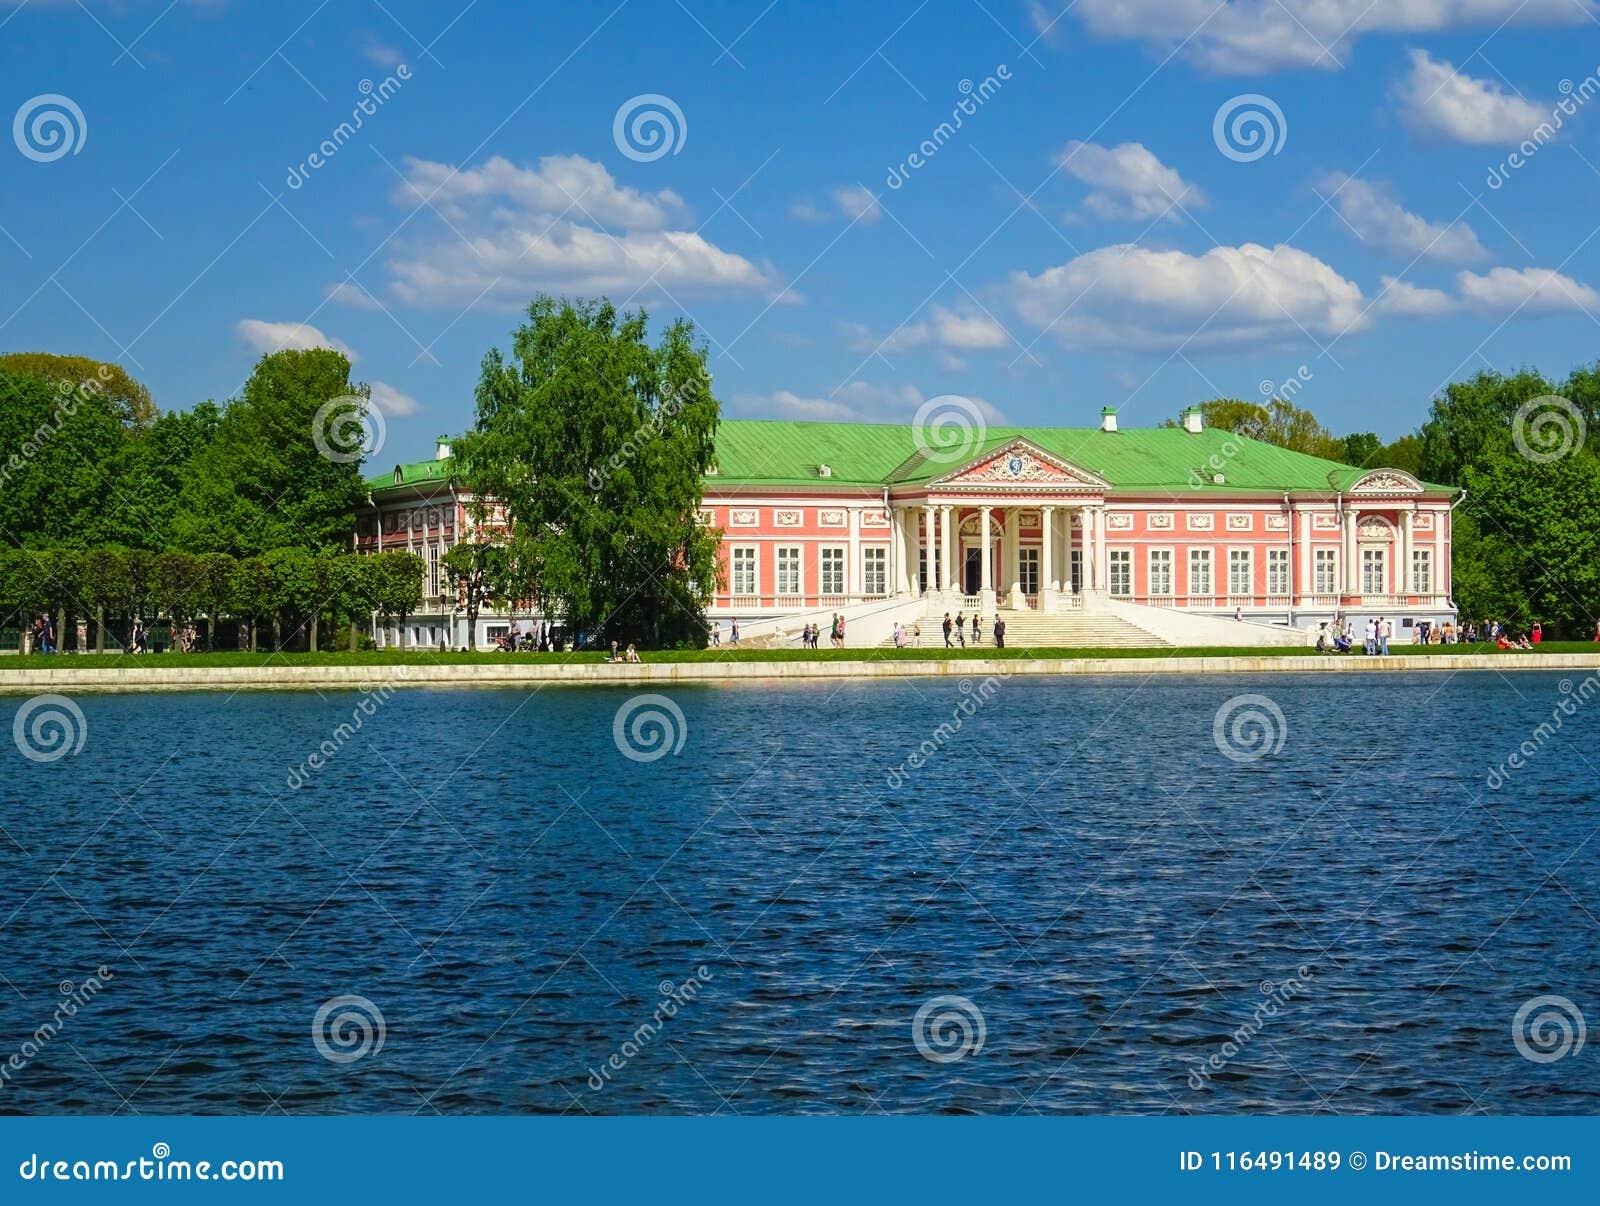 Palace of Sheremetyevs in Kuskovo Park